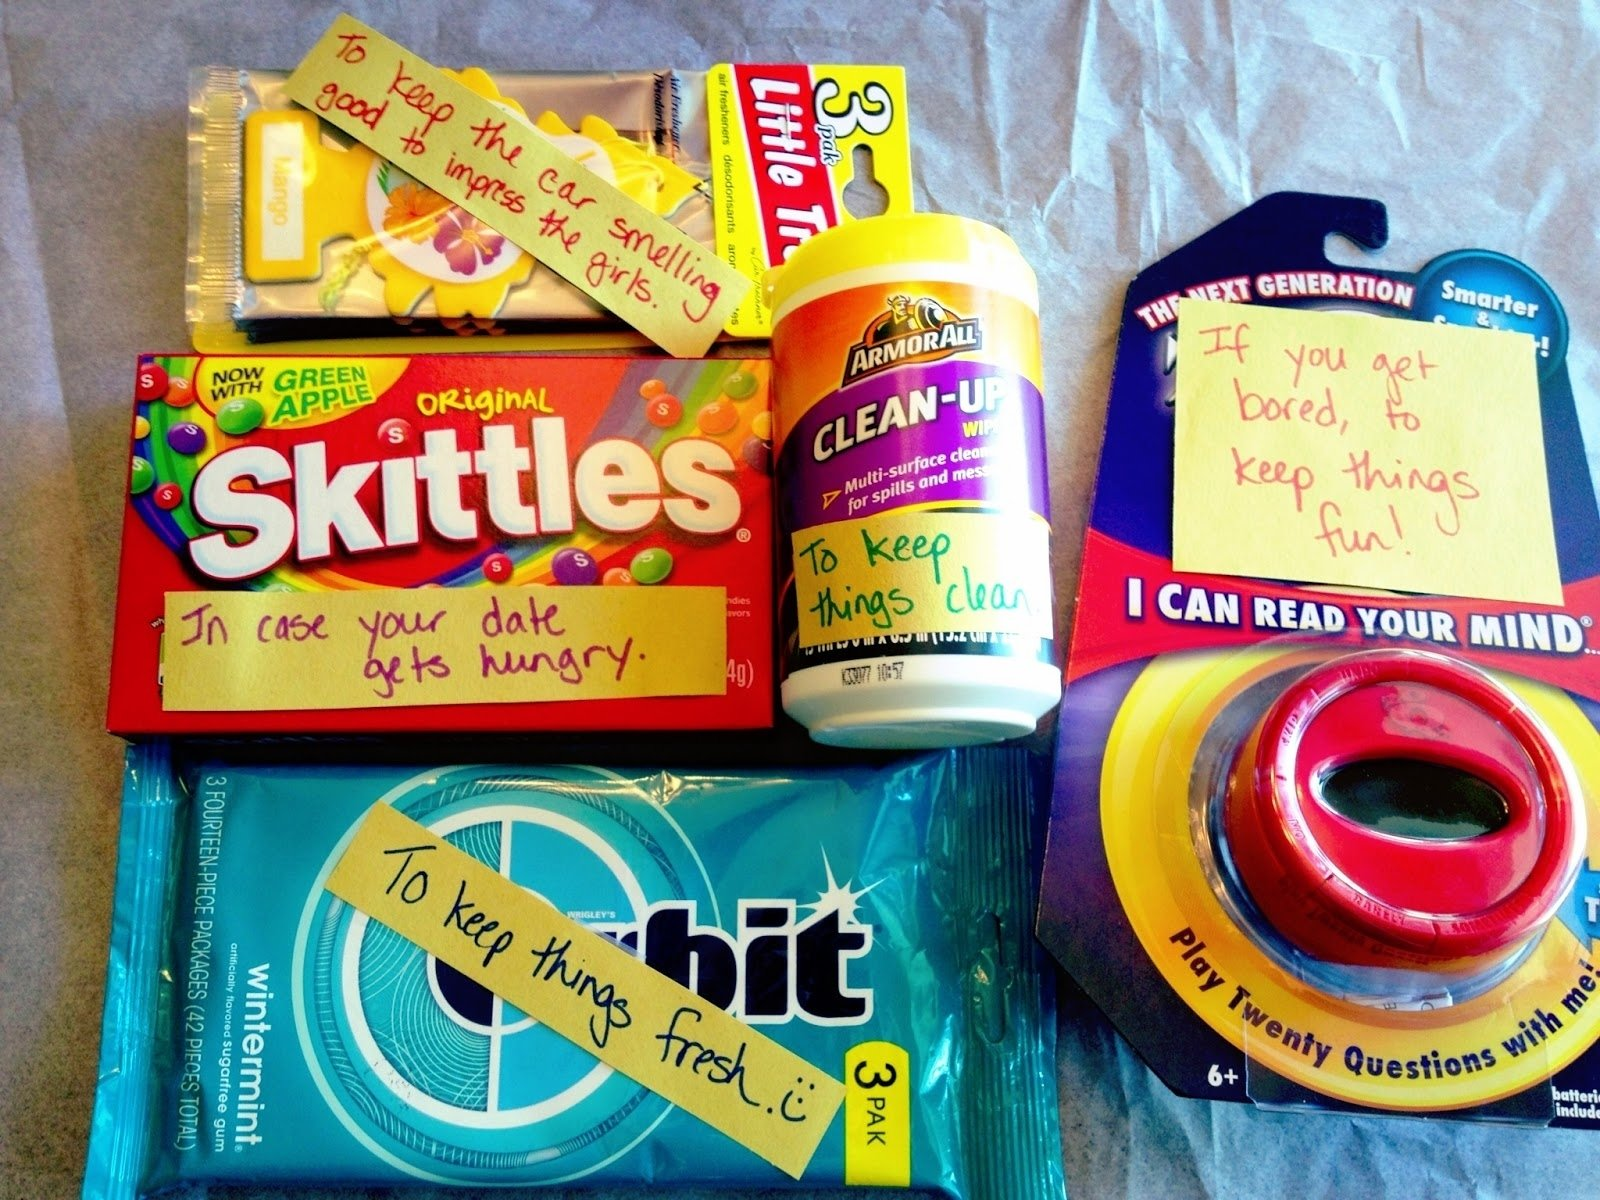 10 Nice Gift Ideas For 16Th Birthday 16th birthday party ideas for boys bing images birthday ideas 26